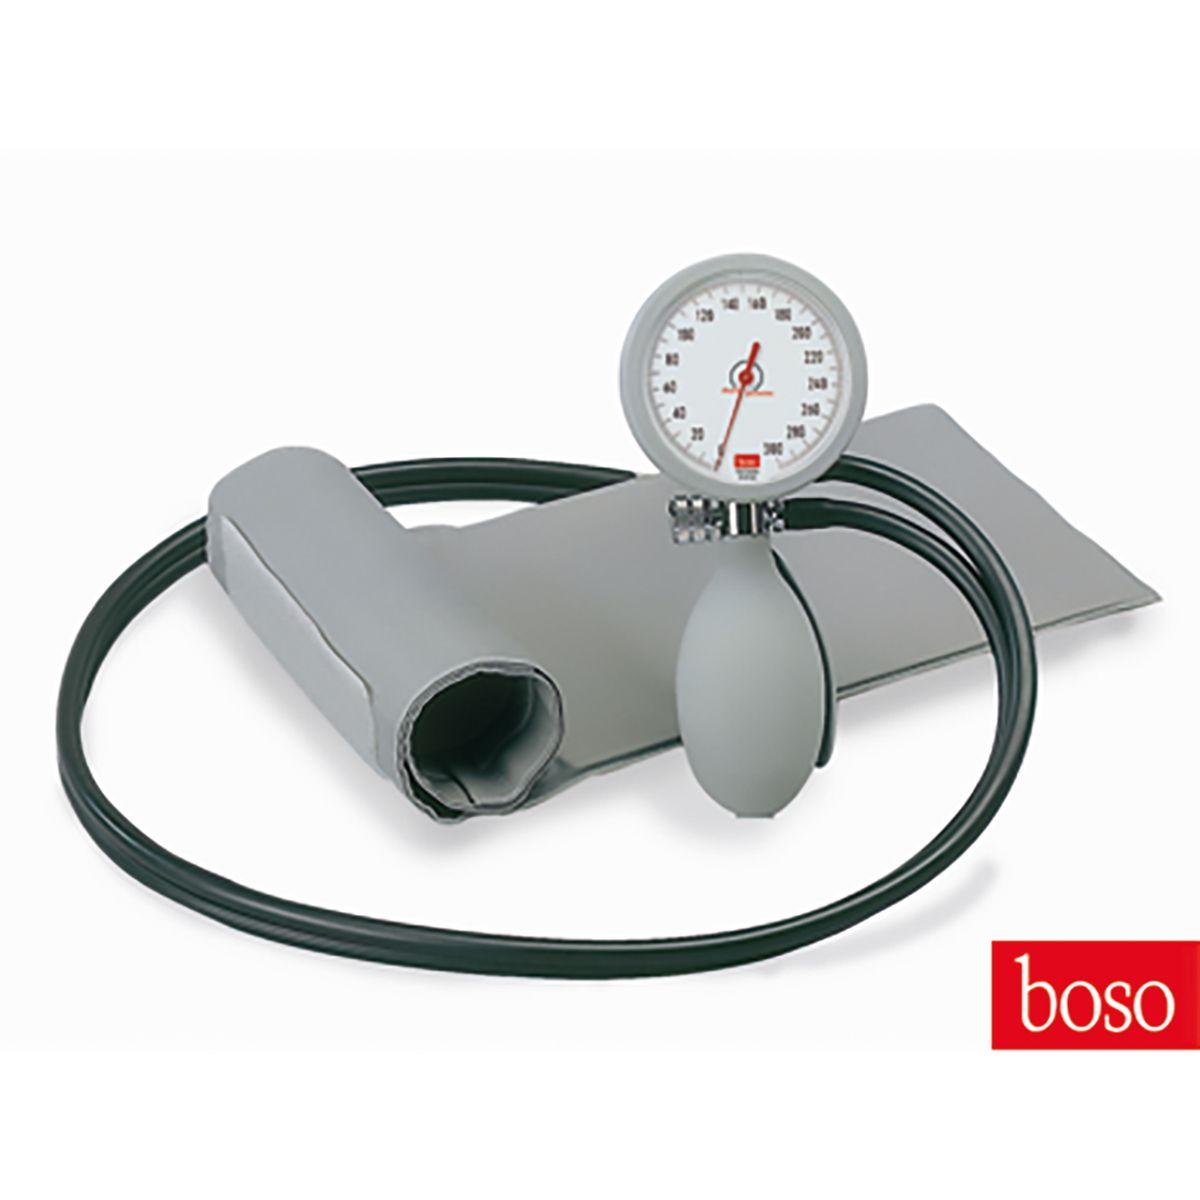 slide image Blutdruckmesser boso KII